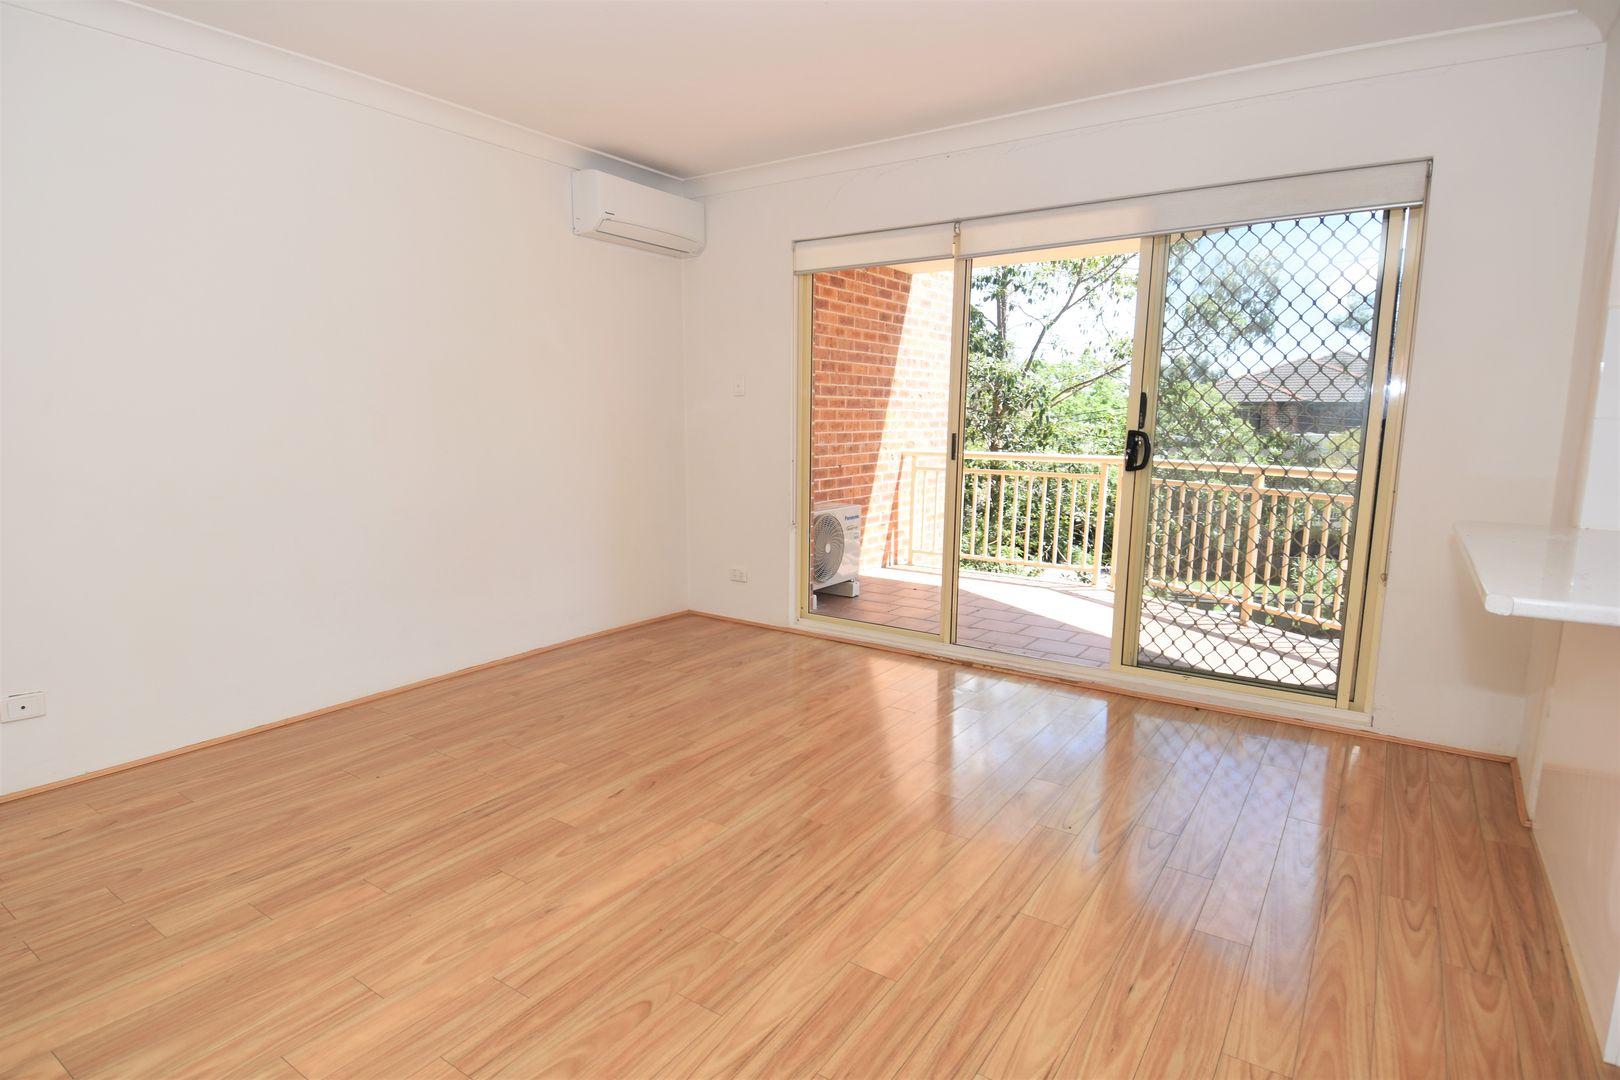 6/506-512 President Avenue, Sutherland NSW 2232, Image 1